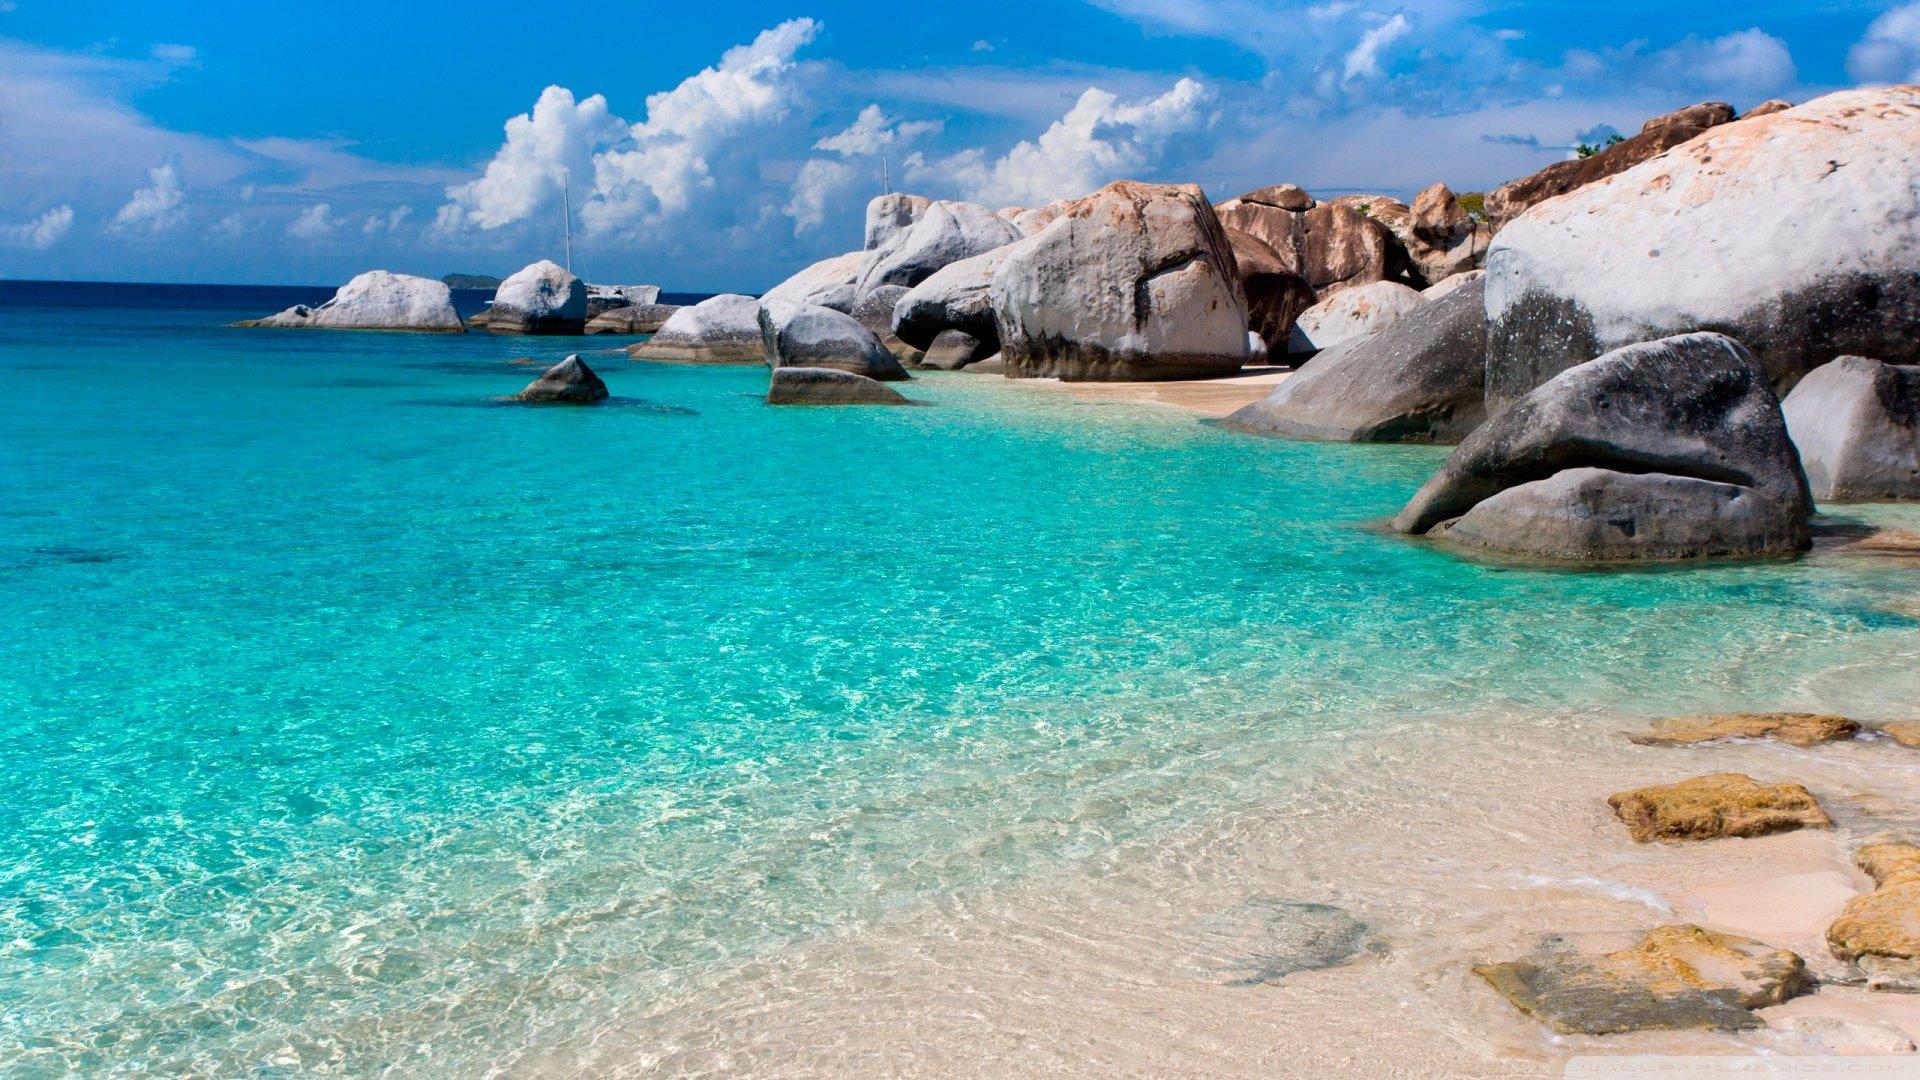 Beautiful Summer Beach Scenes Wallpapers